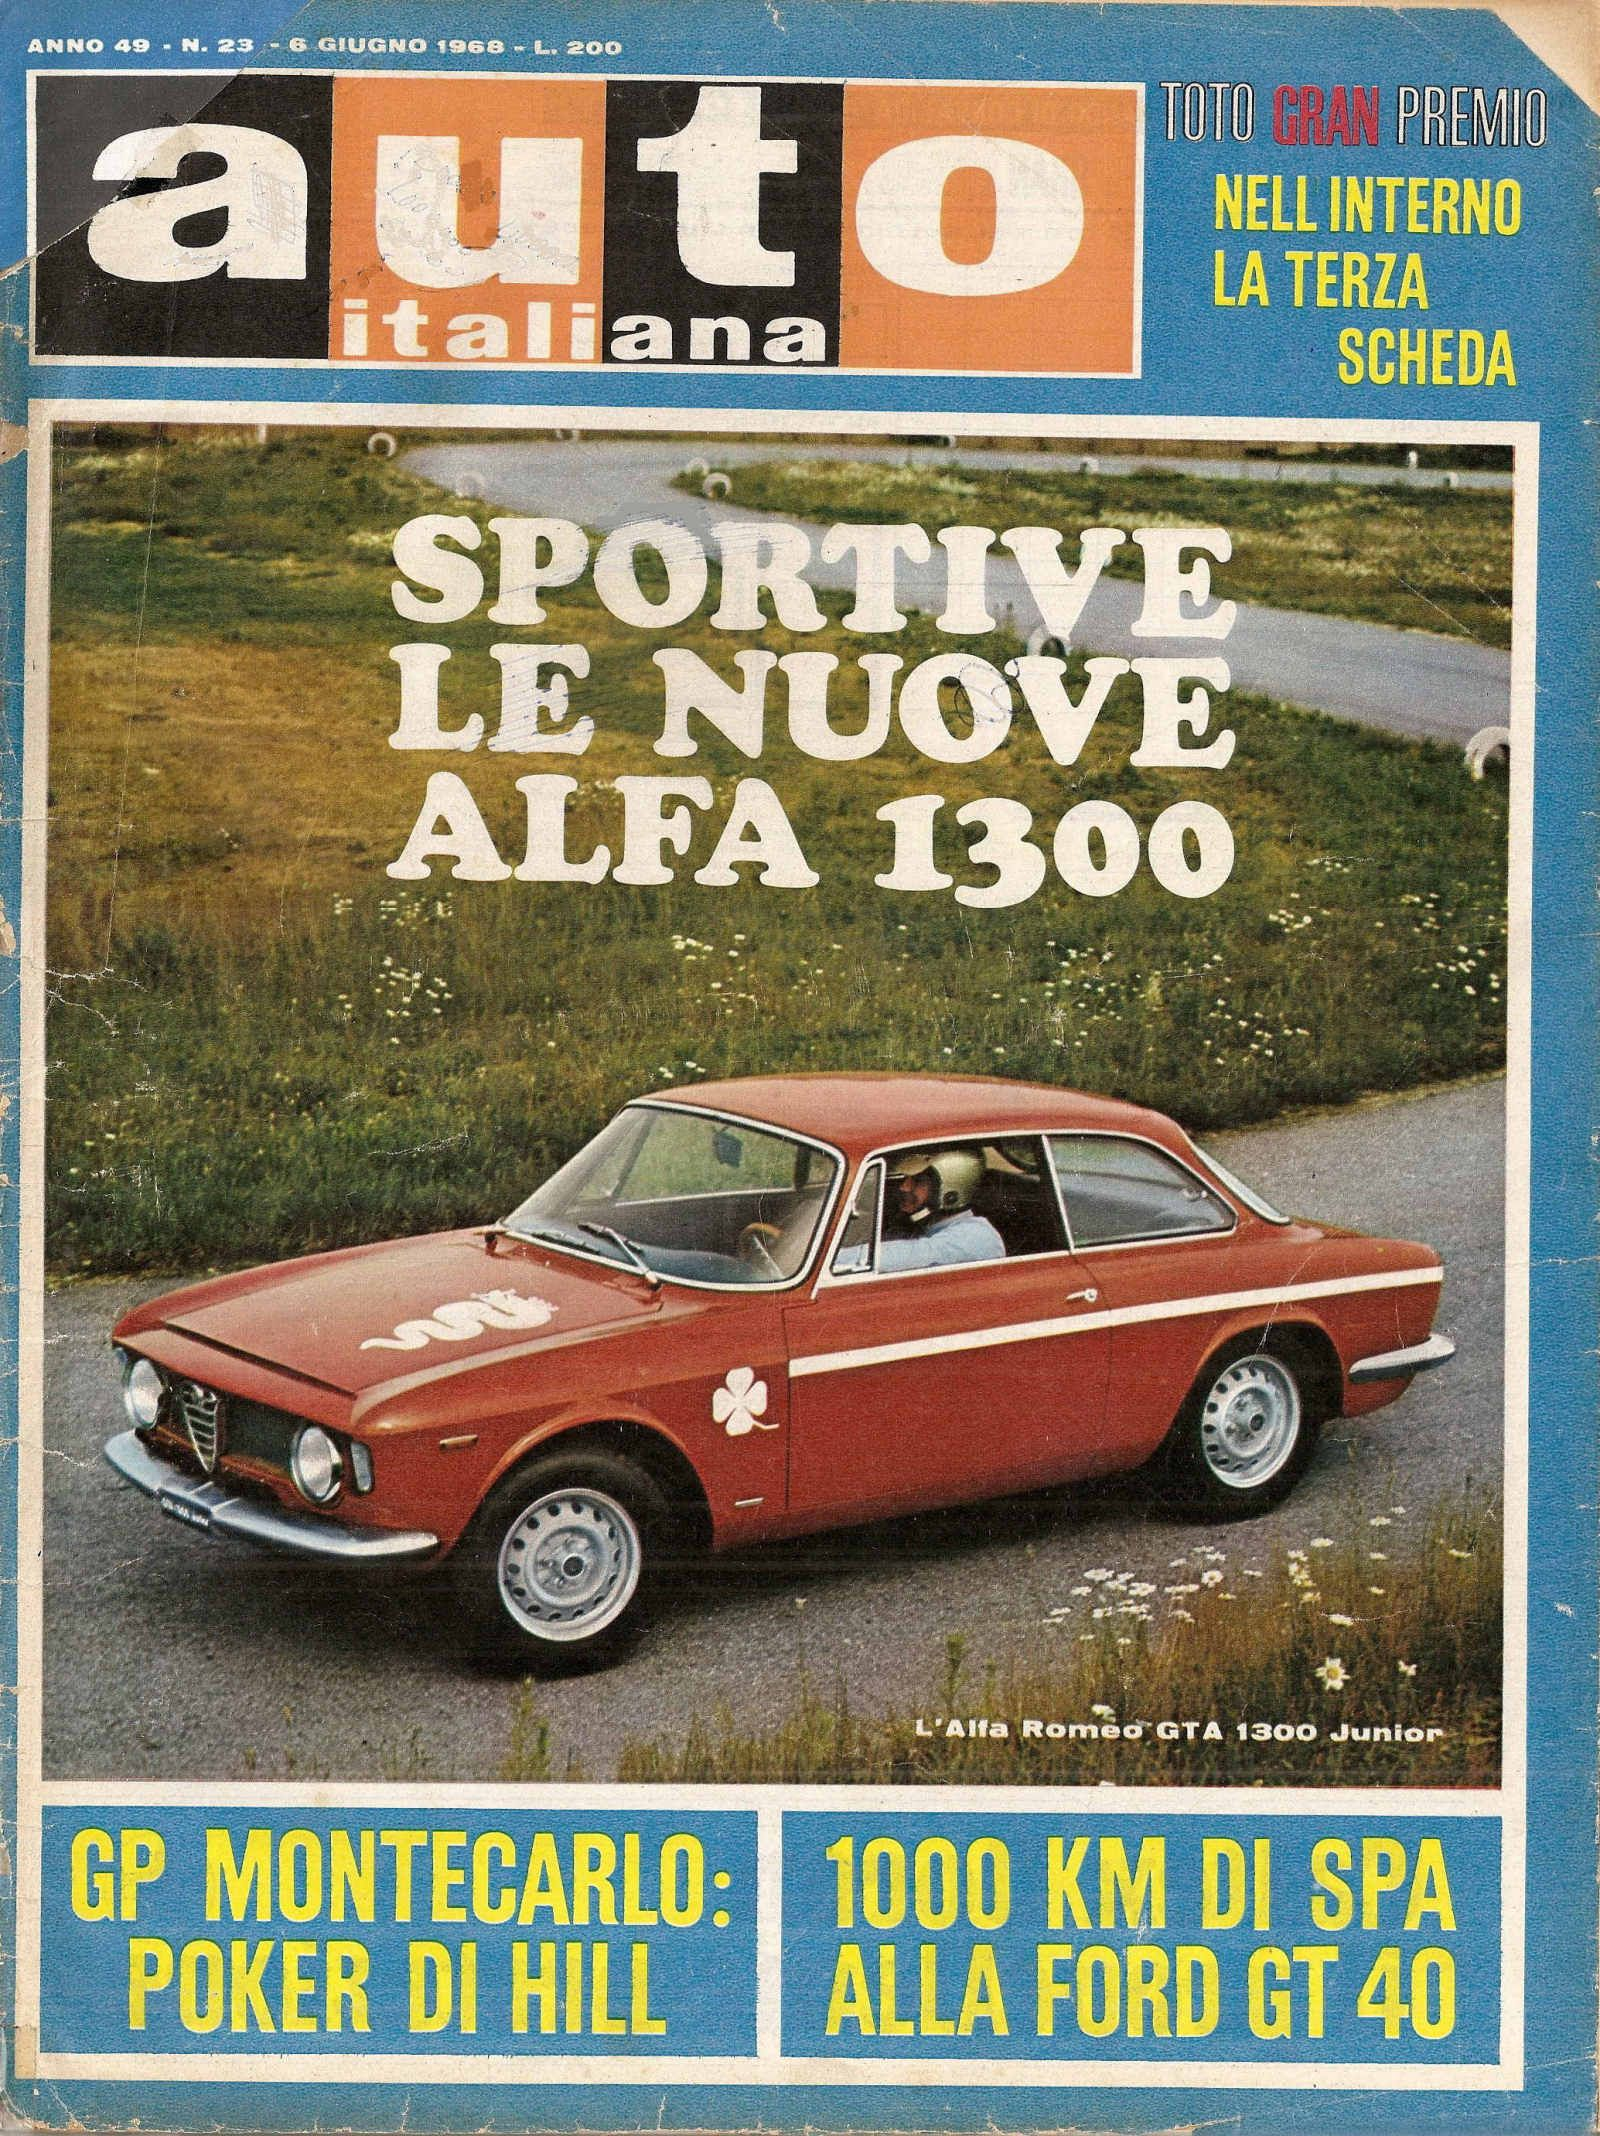 1968 #AlfaRomeo Giulia GTA review on italian car magazine \